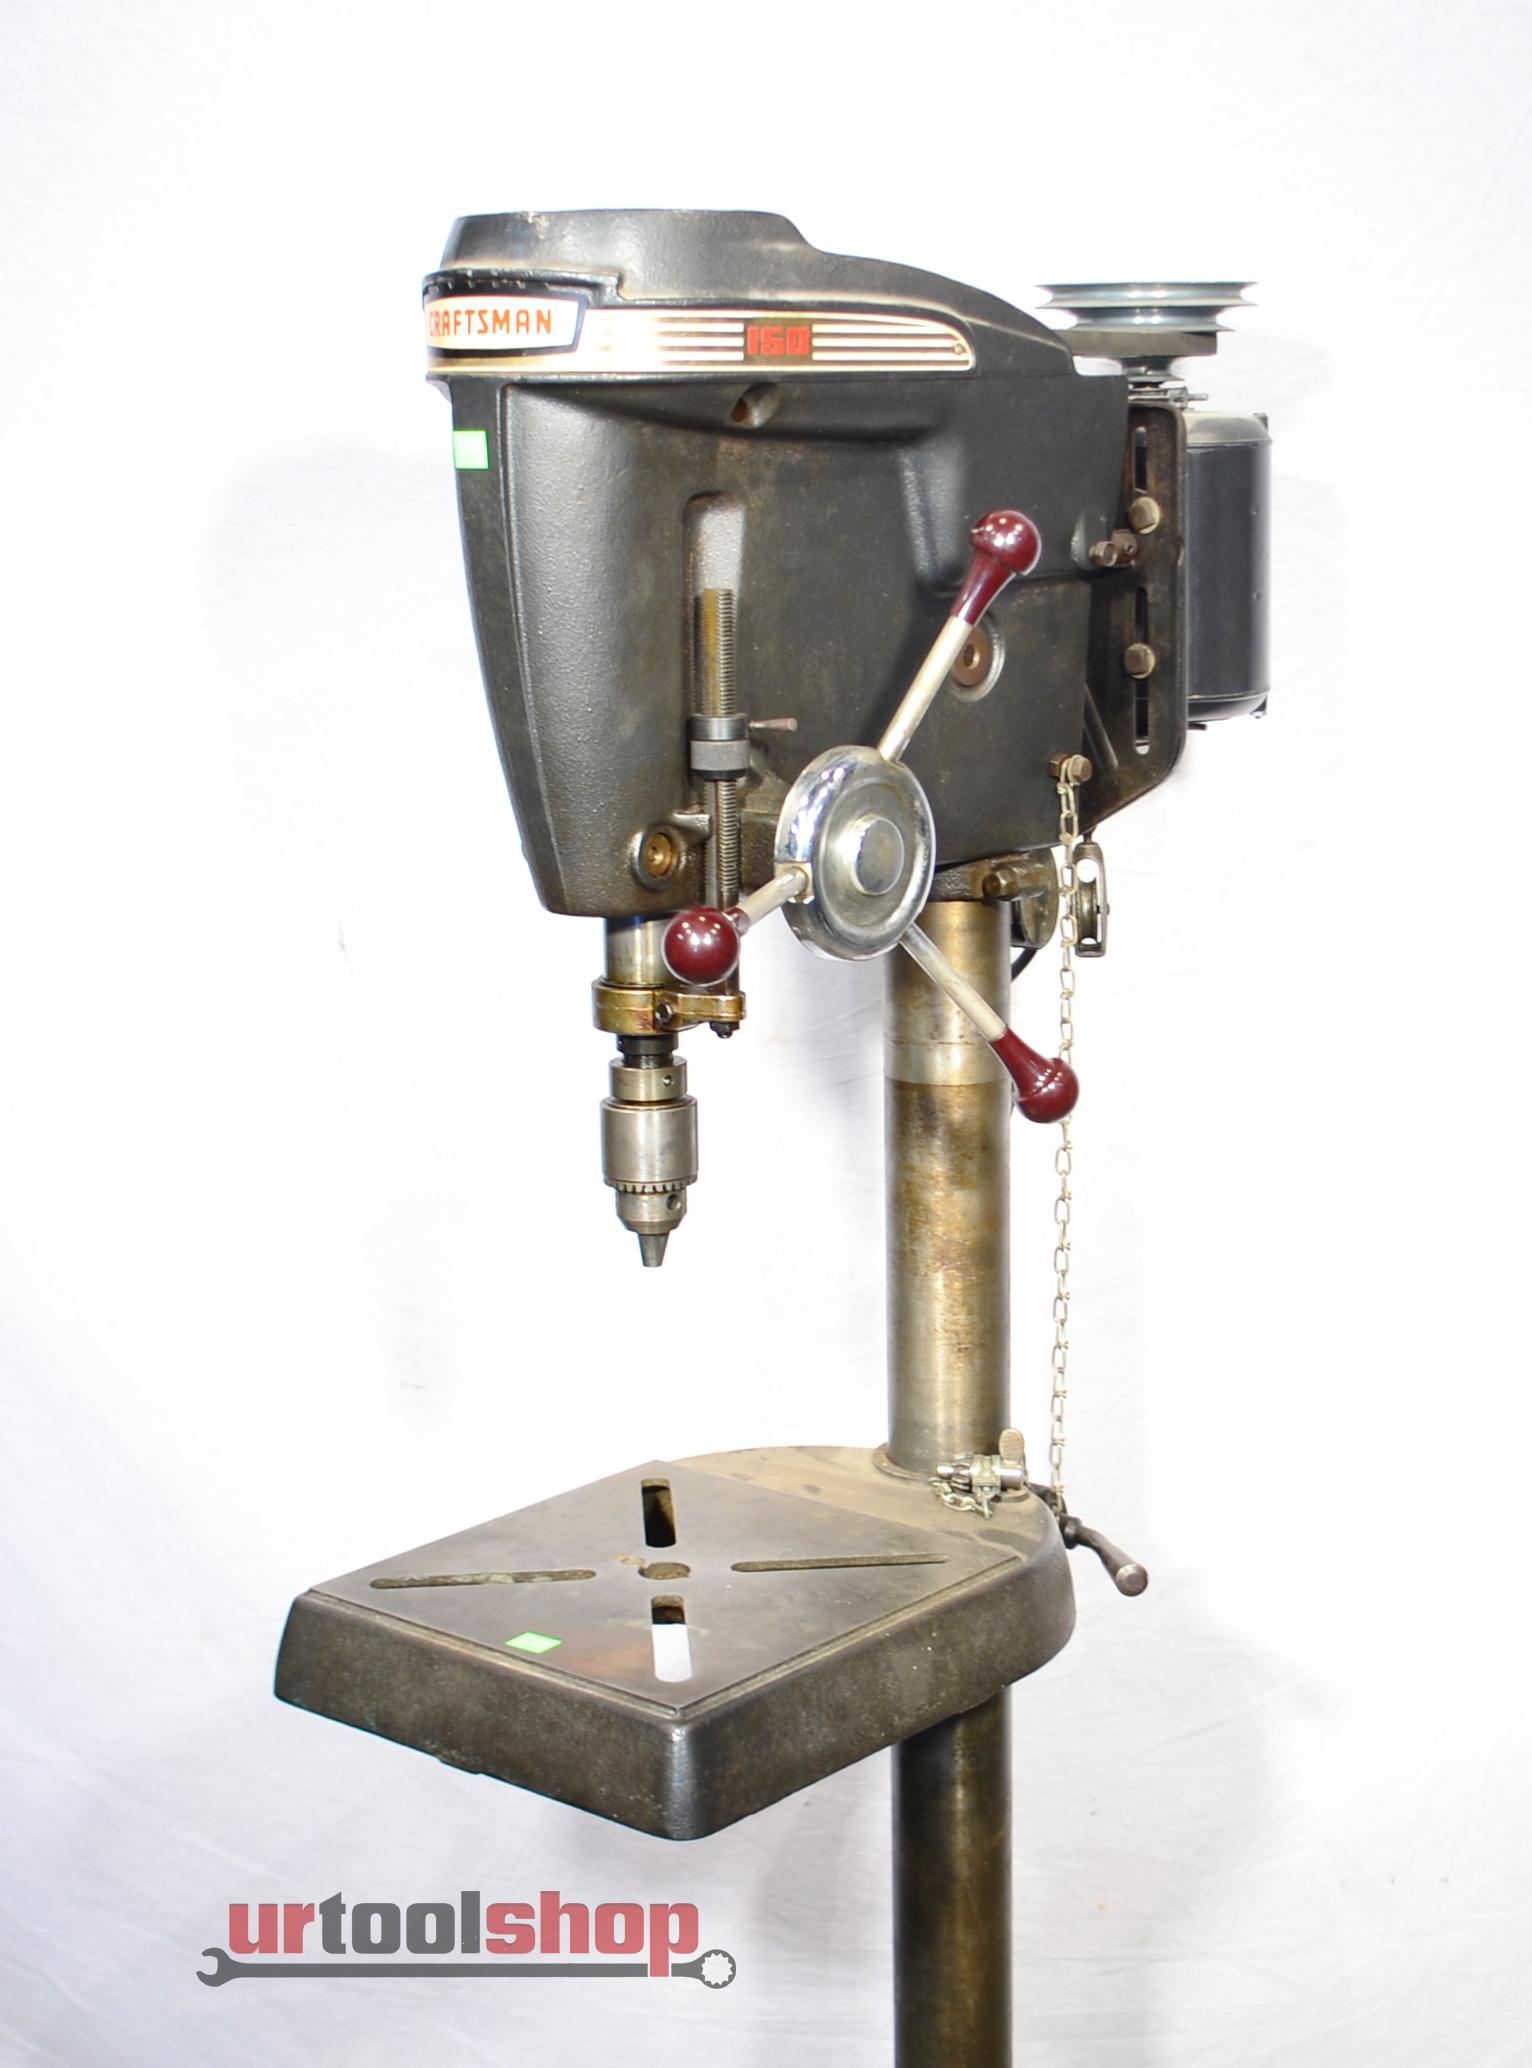 Vintage Sears Craftsman 150 Floor Drill Press 113 24511 923 3 Ebay